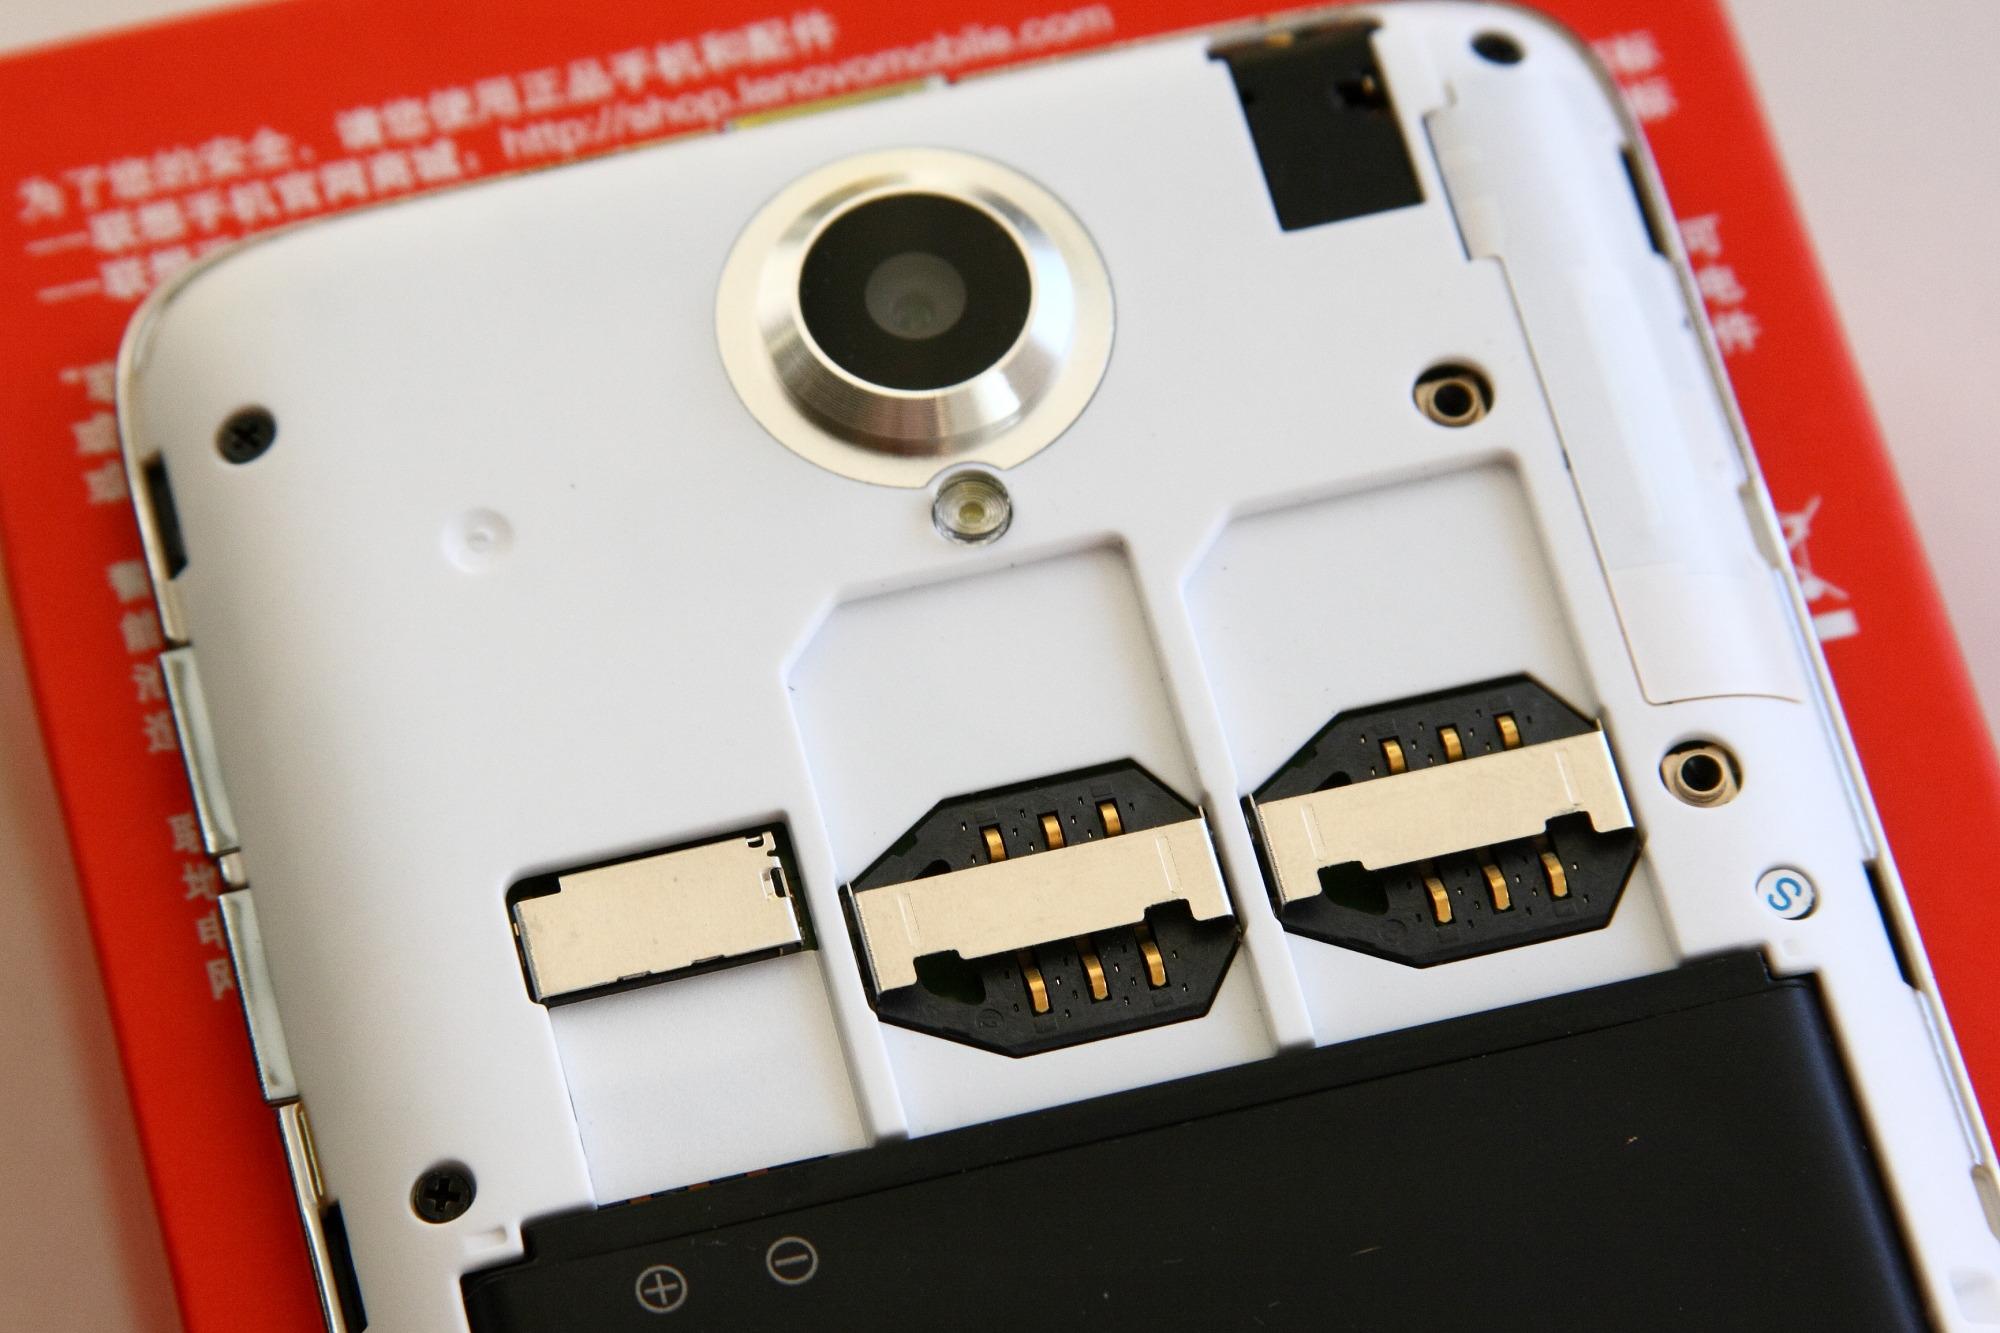 Huawei P10 Sim Karte Einsetzen.Dual Sim Handy Wikipedia